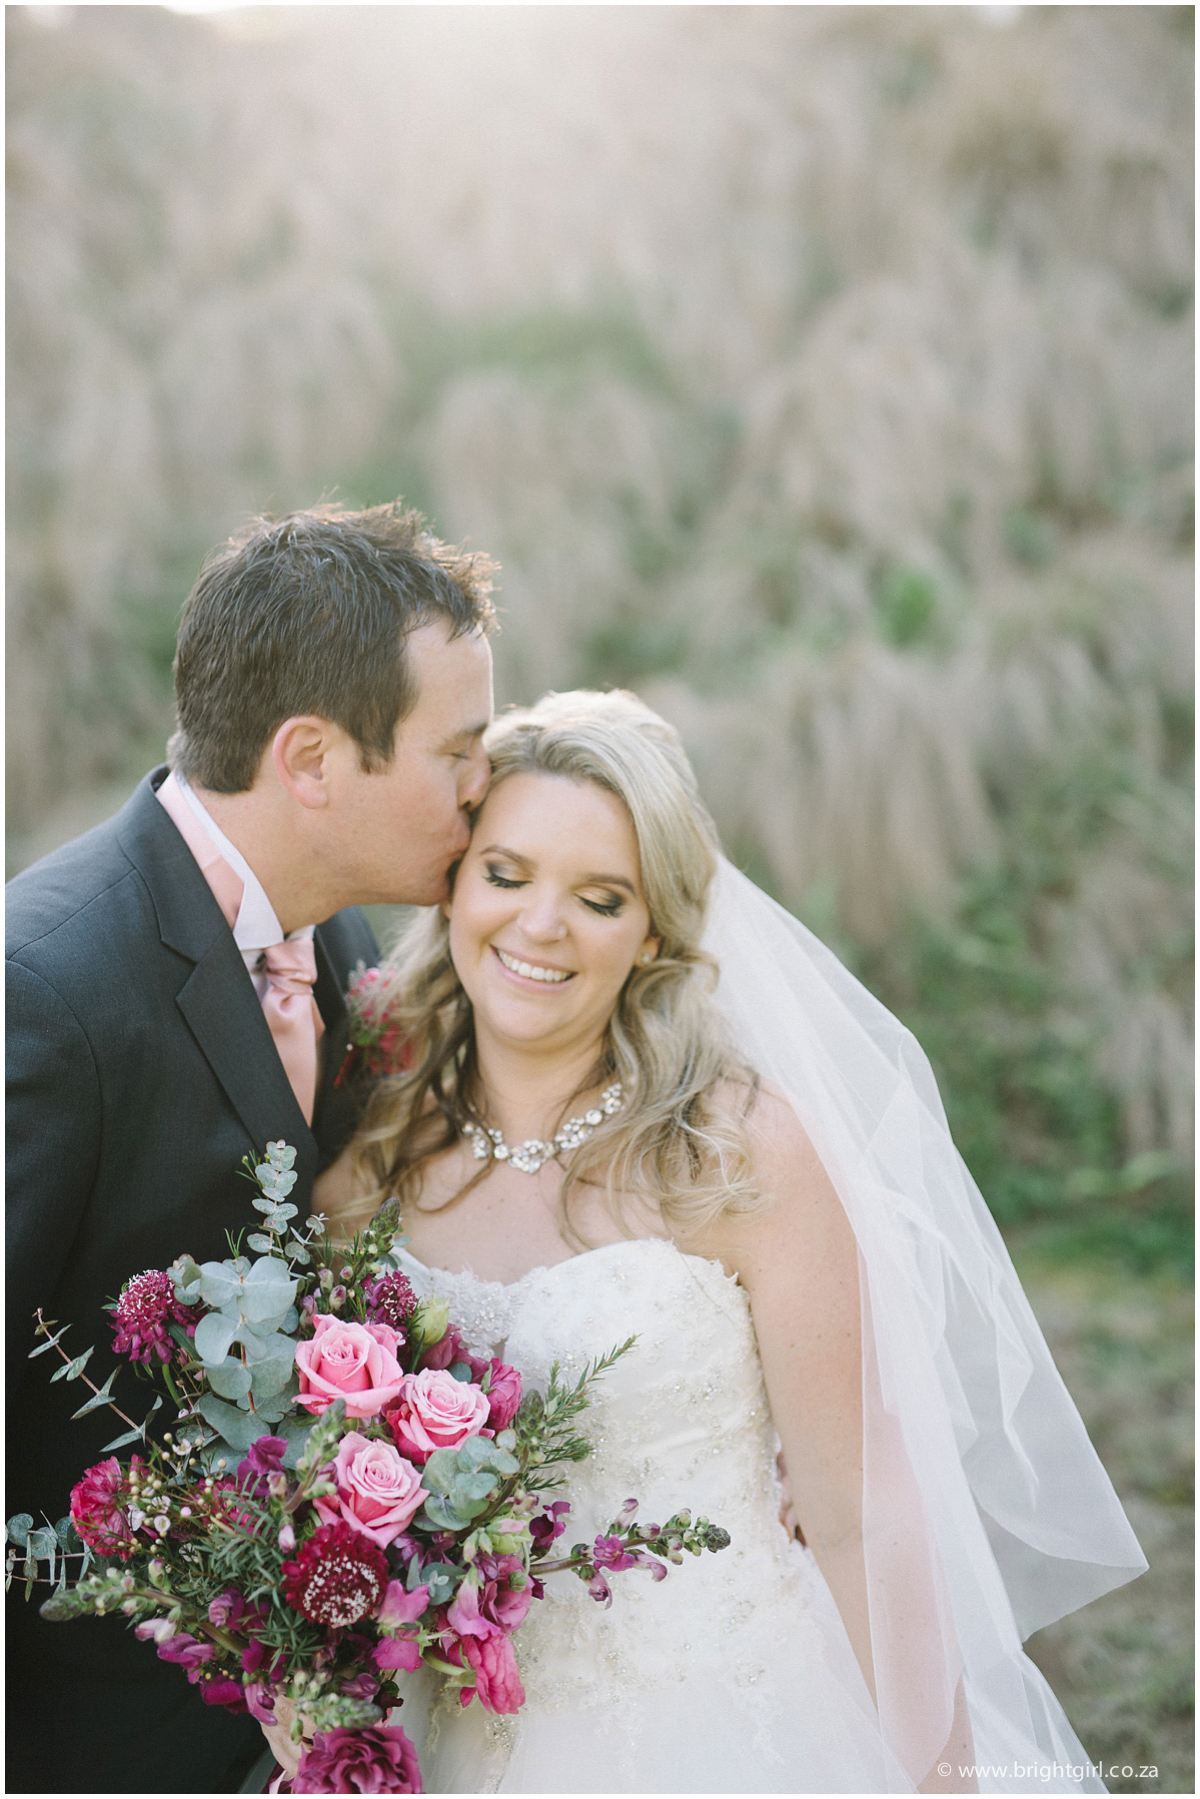 talloula-wedding-tarryn-chris-40